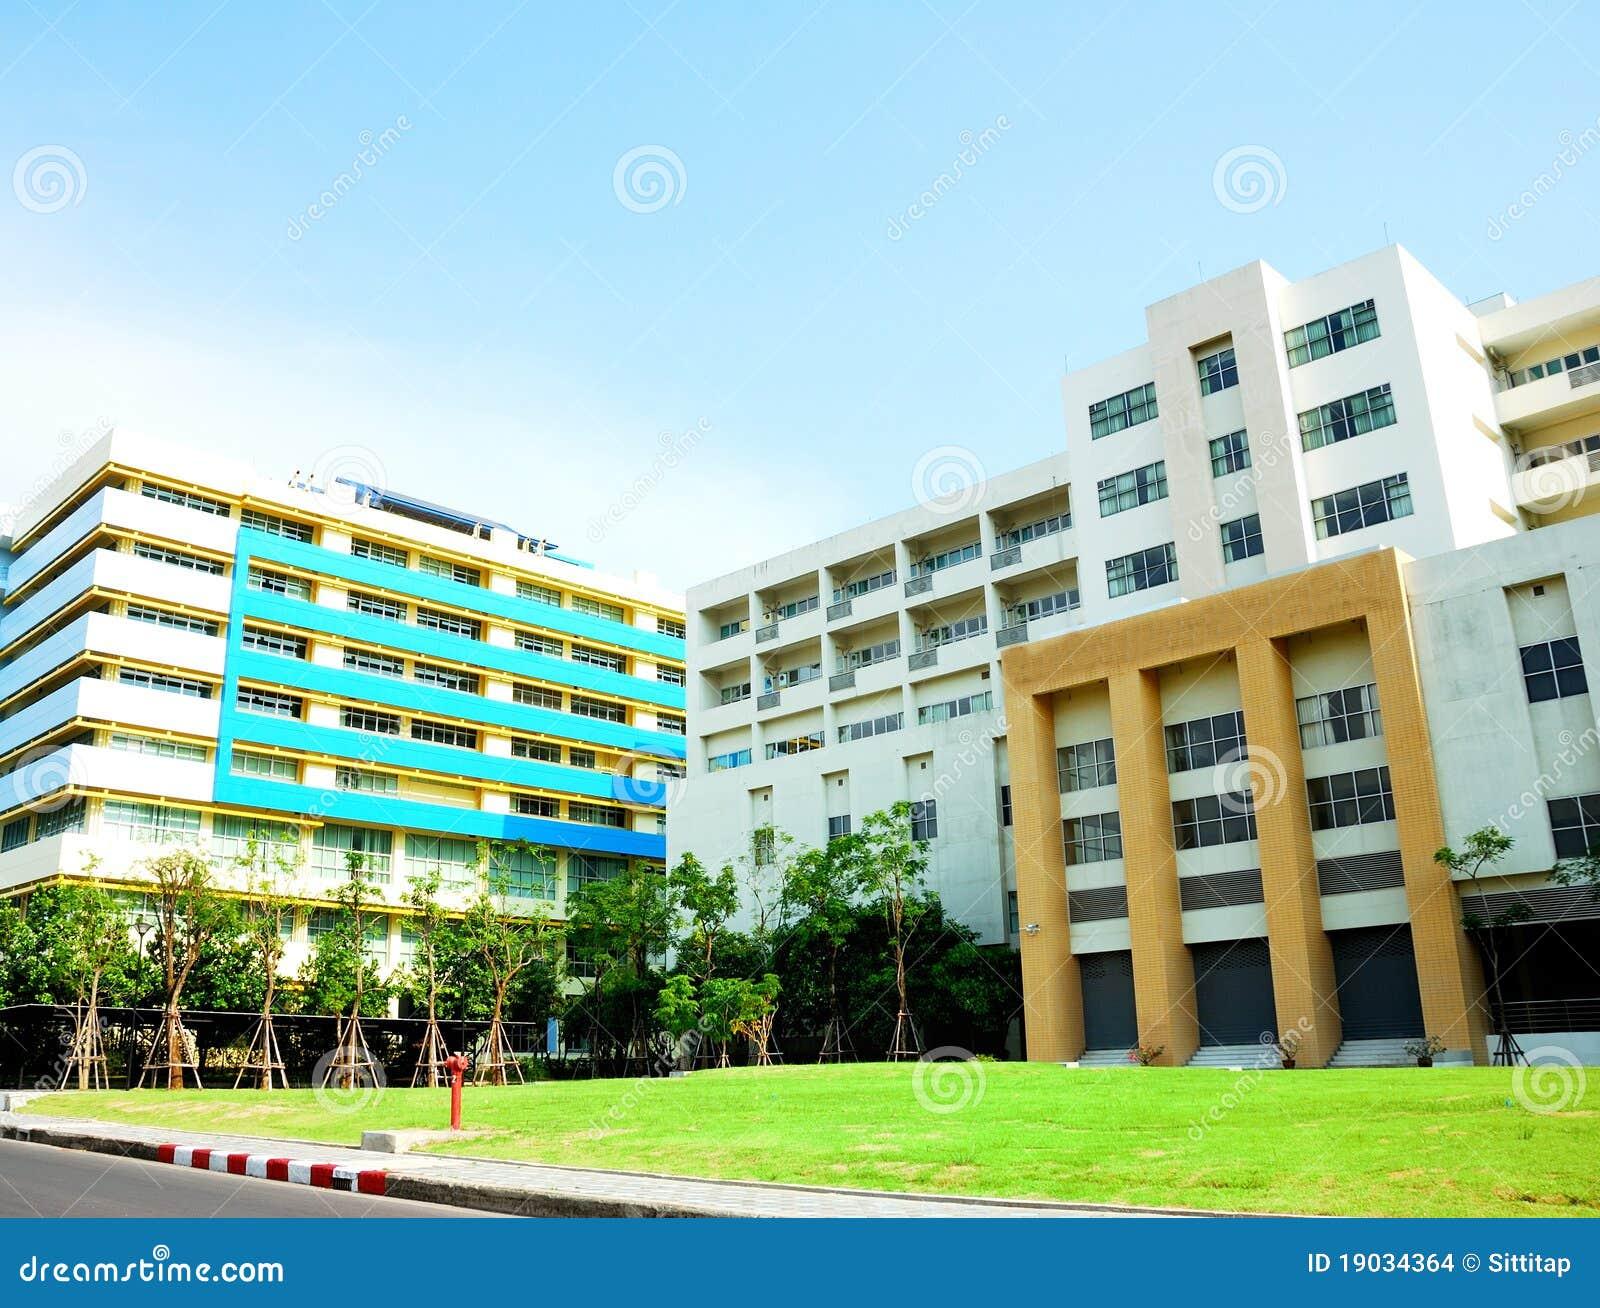 Building medical practice